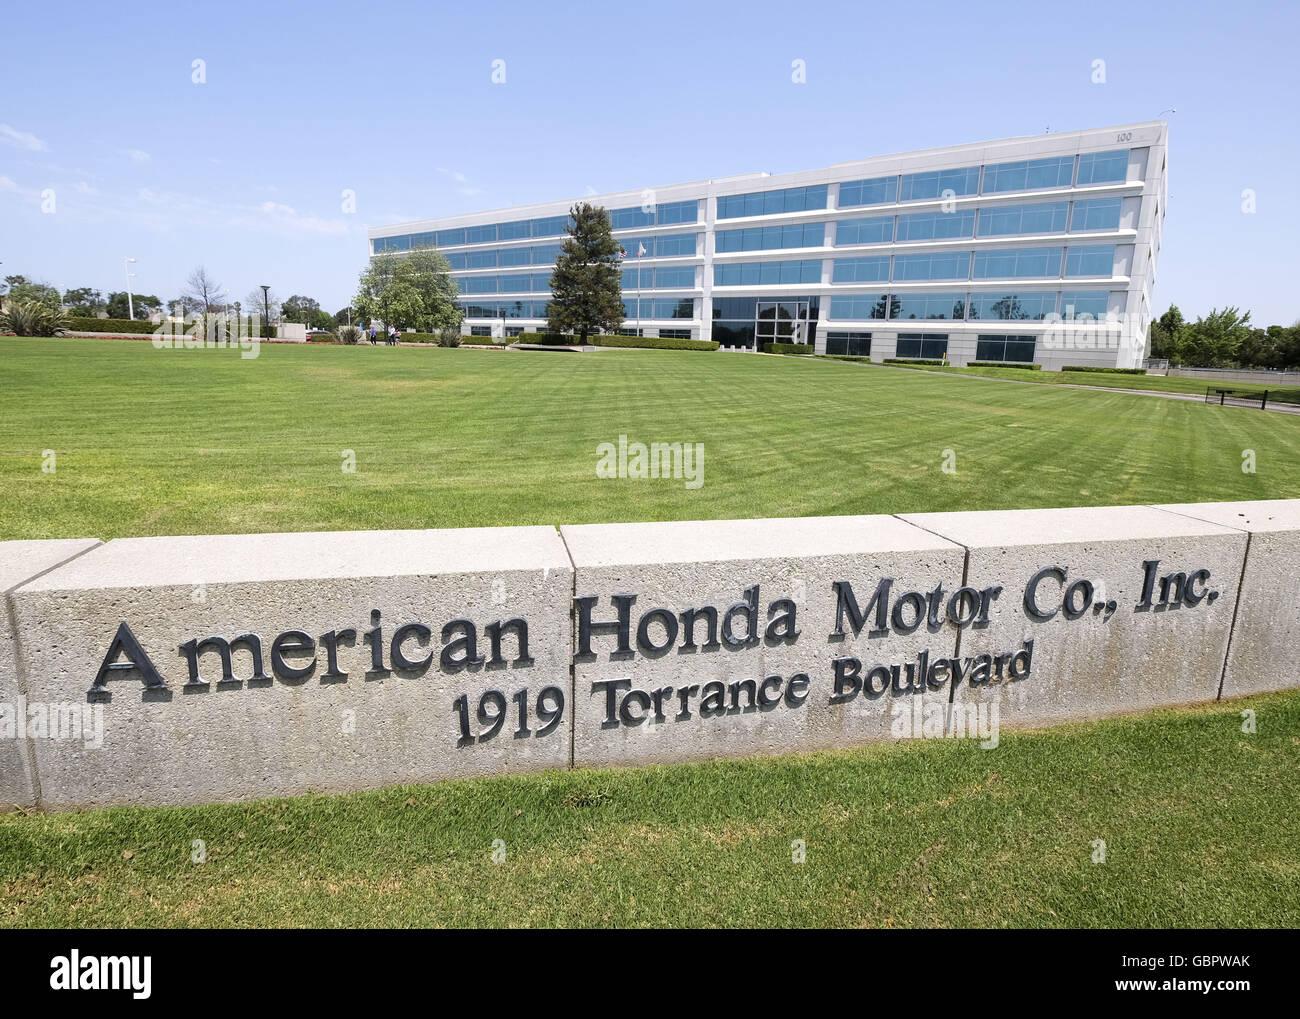 Los Angeles, California, USA. 21st June, 2016. American Honda Motor Co